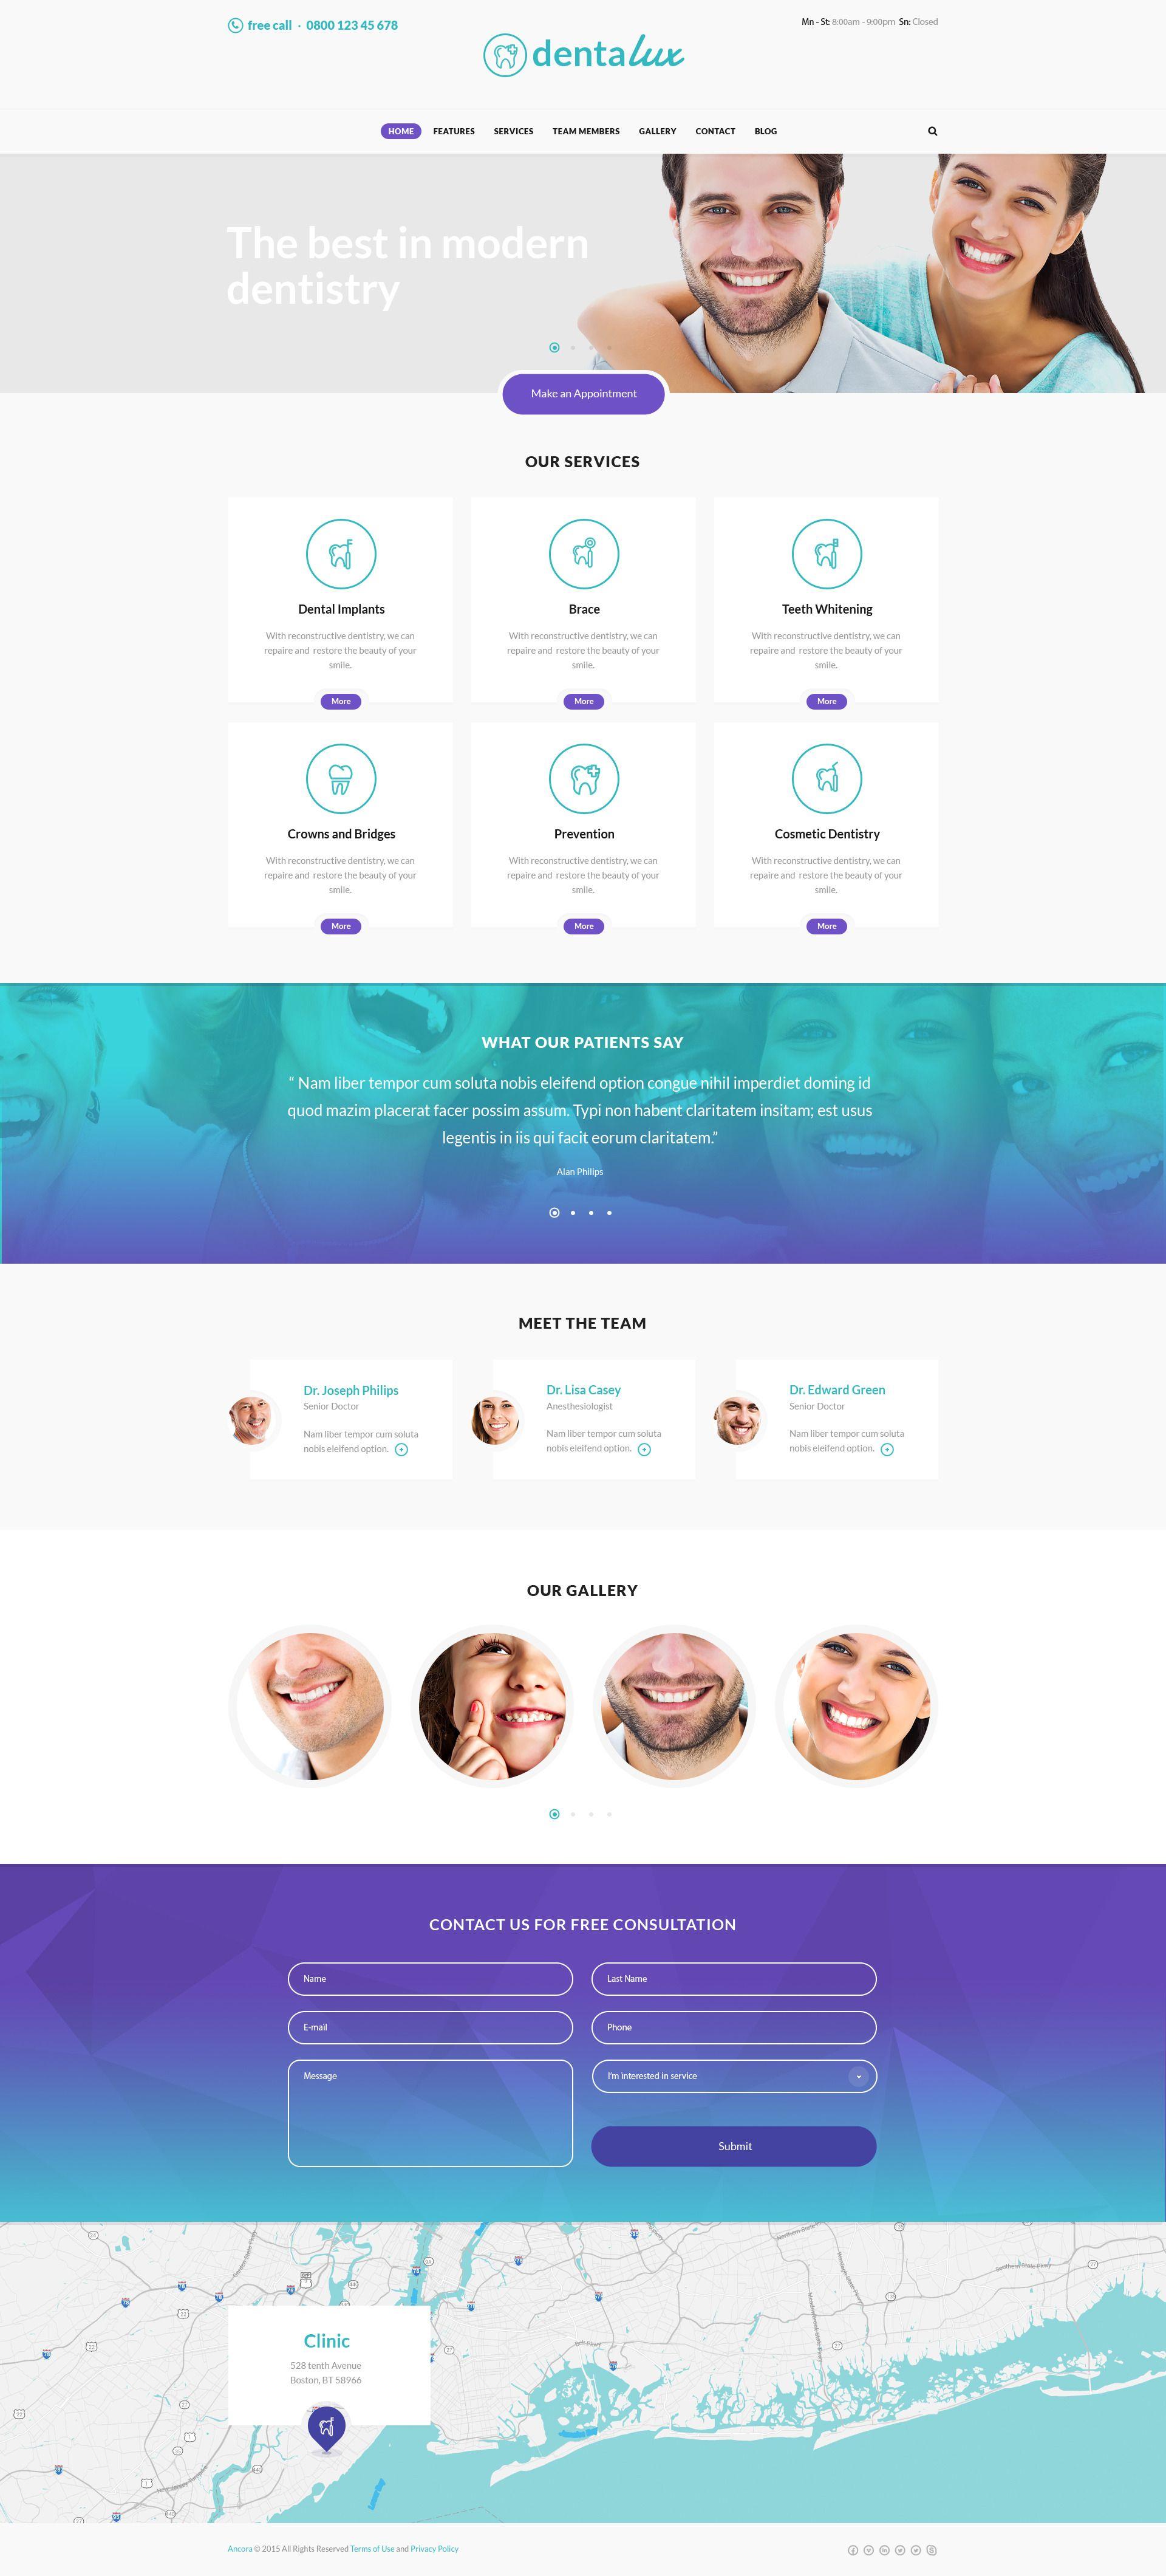 Dentalux A Dentist Medical Healthcare Doctor Wordpress Theme Dentistas Layout Marketing